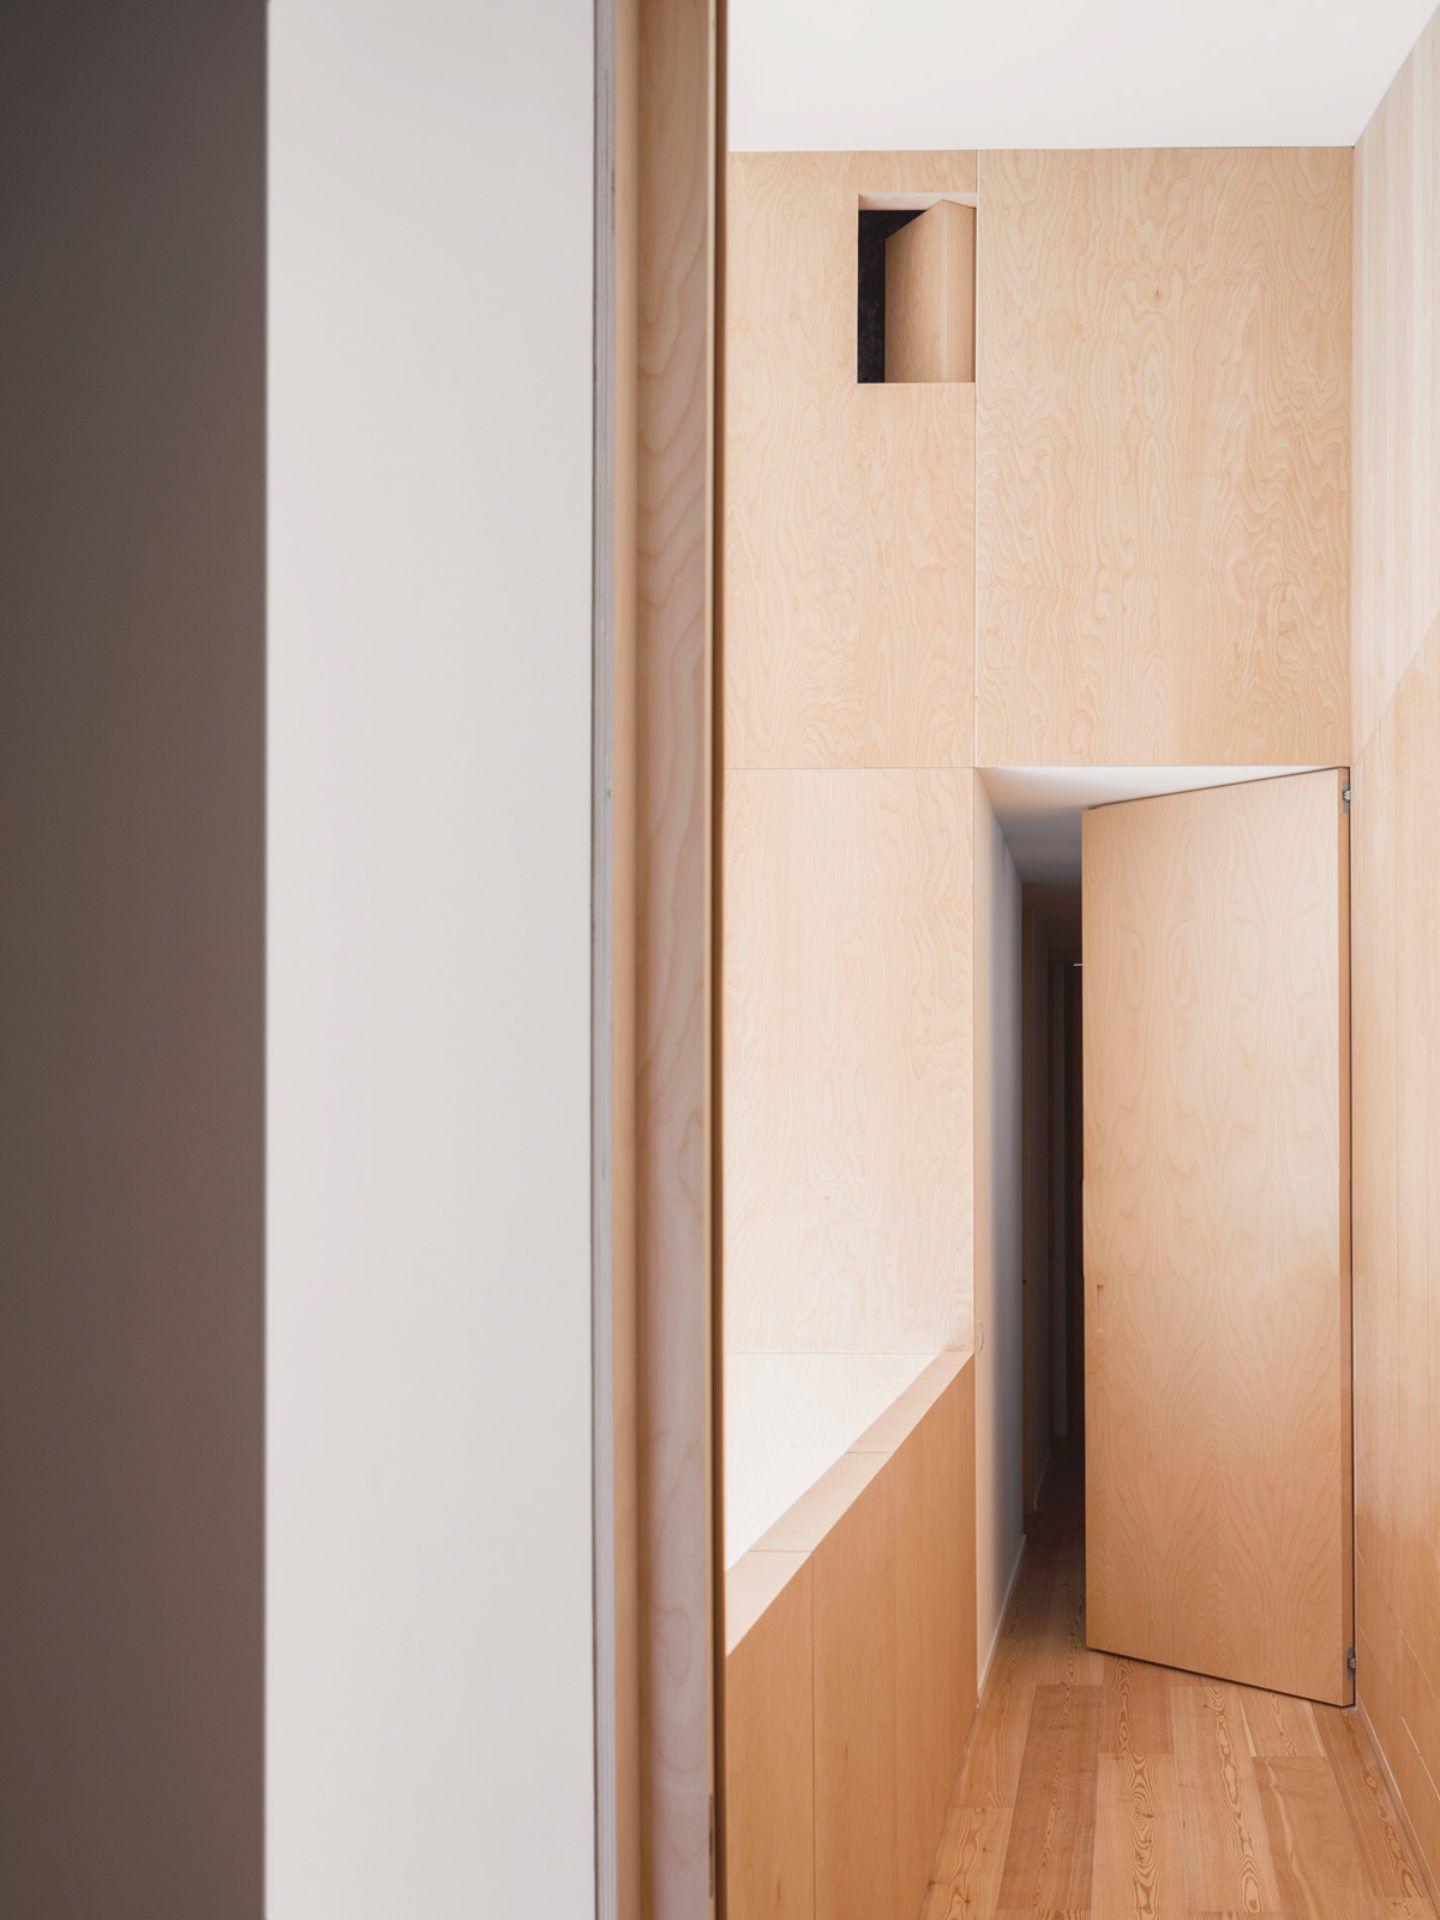 IGNANT-Architecture-Studio-Wok-Country-Home-In-Chievo-22